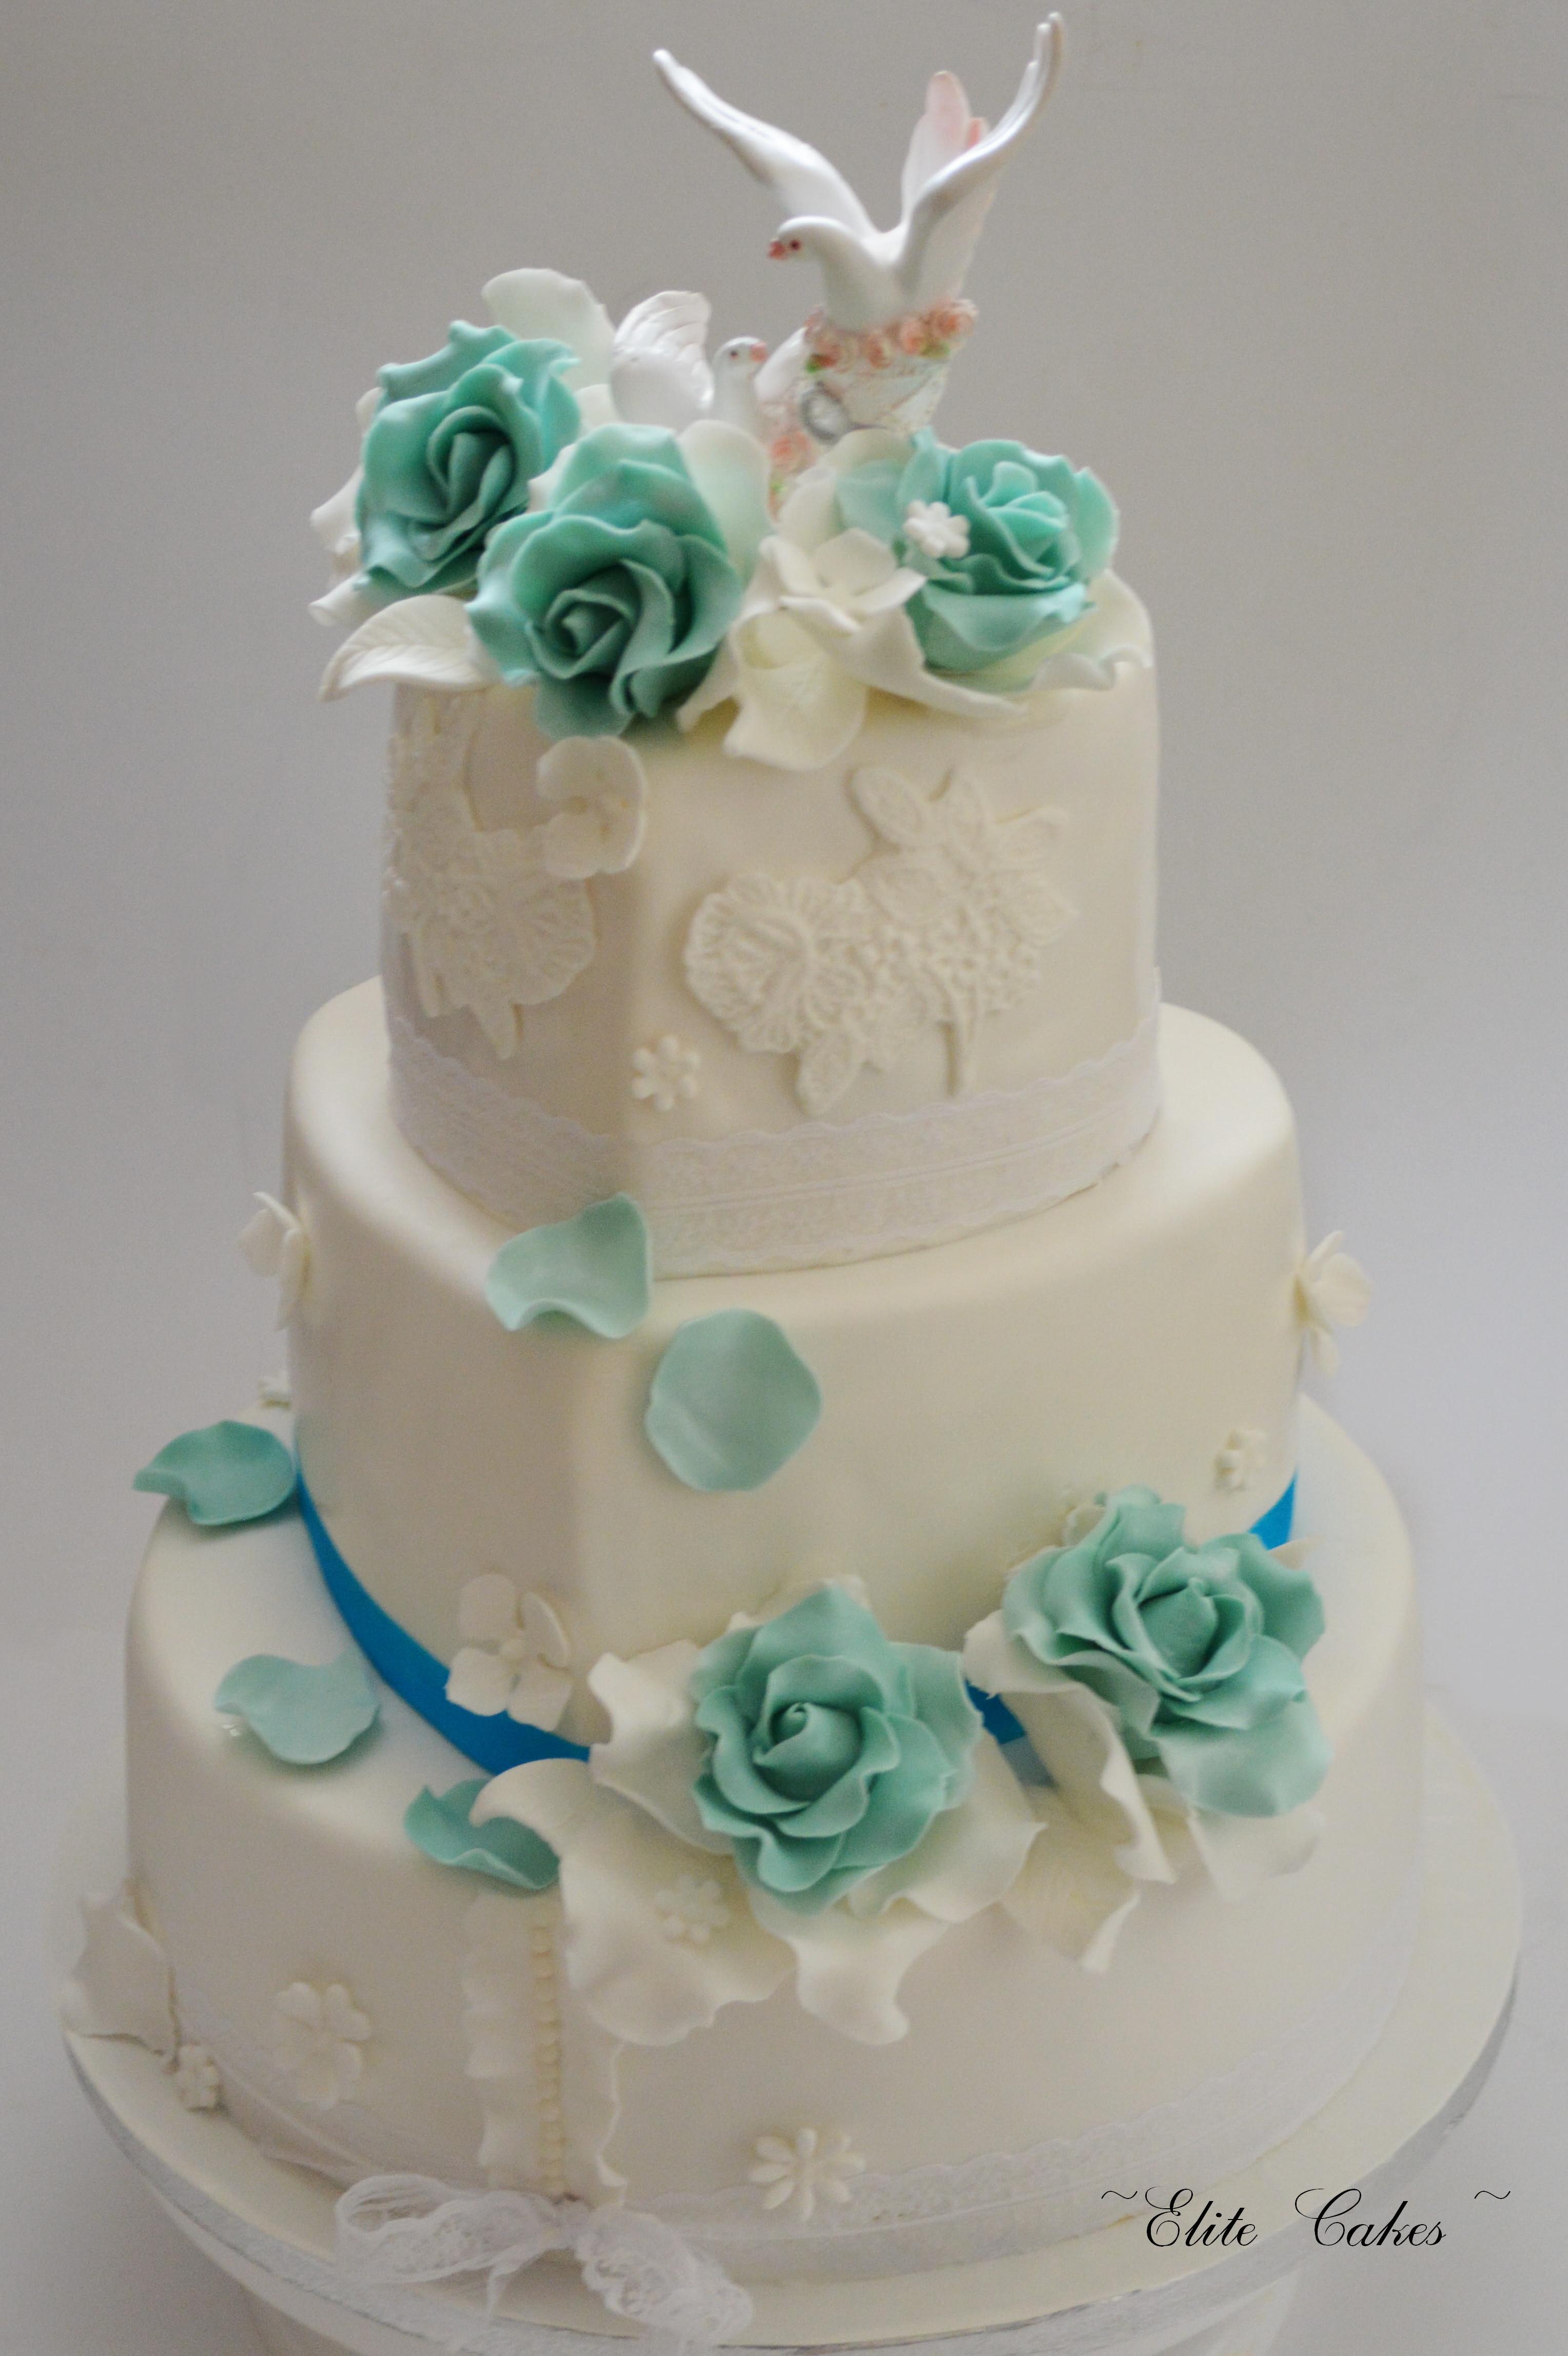 Wedding Cakes On Line  Order Your Wedding Cake line Elite Cakes Boutique